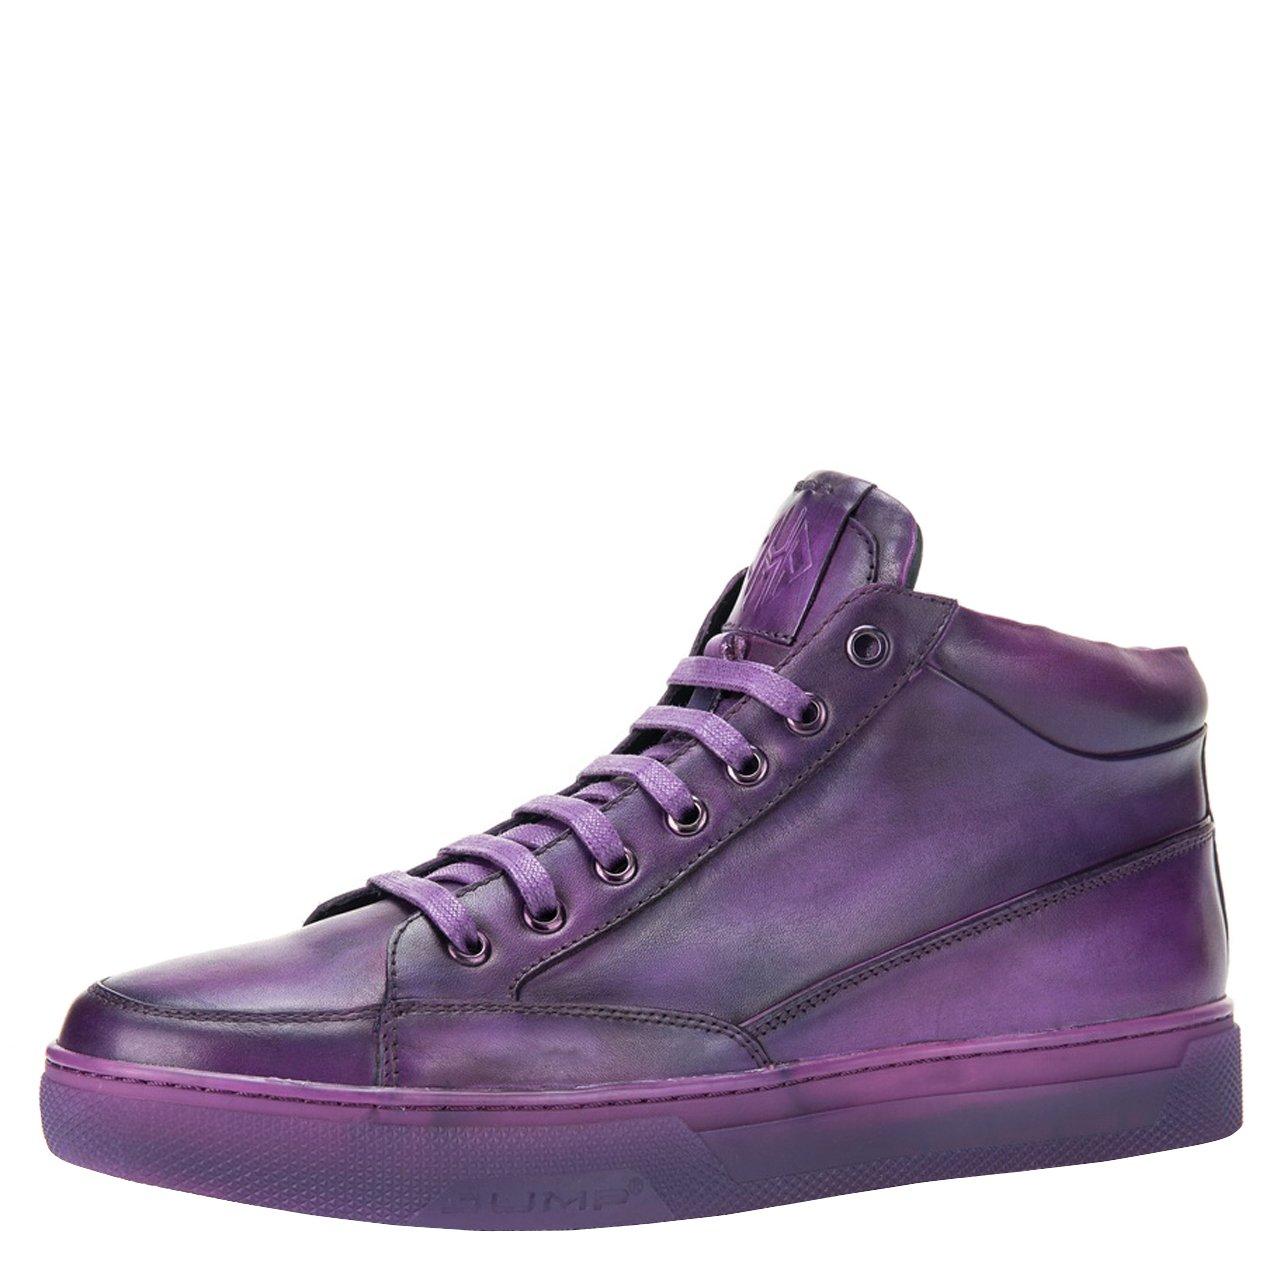 JUMP NEWYORK Men's Strickland Mid-Top Fashion Sneaker Purple 11 D US